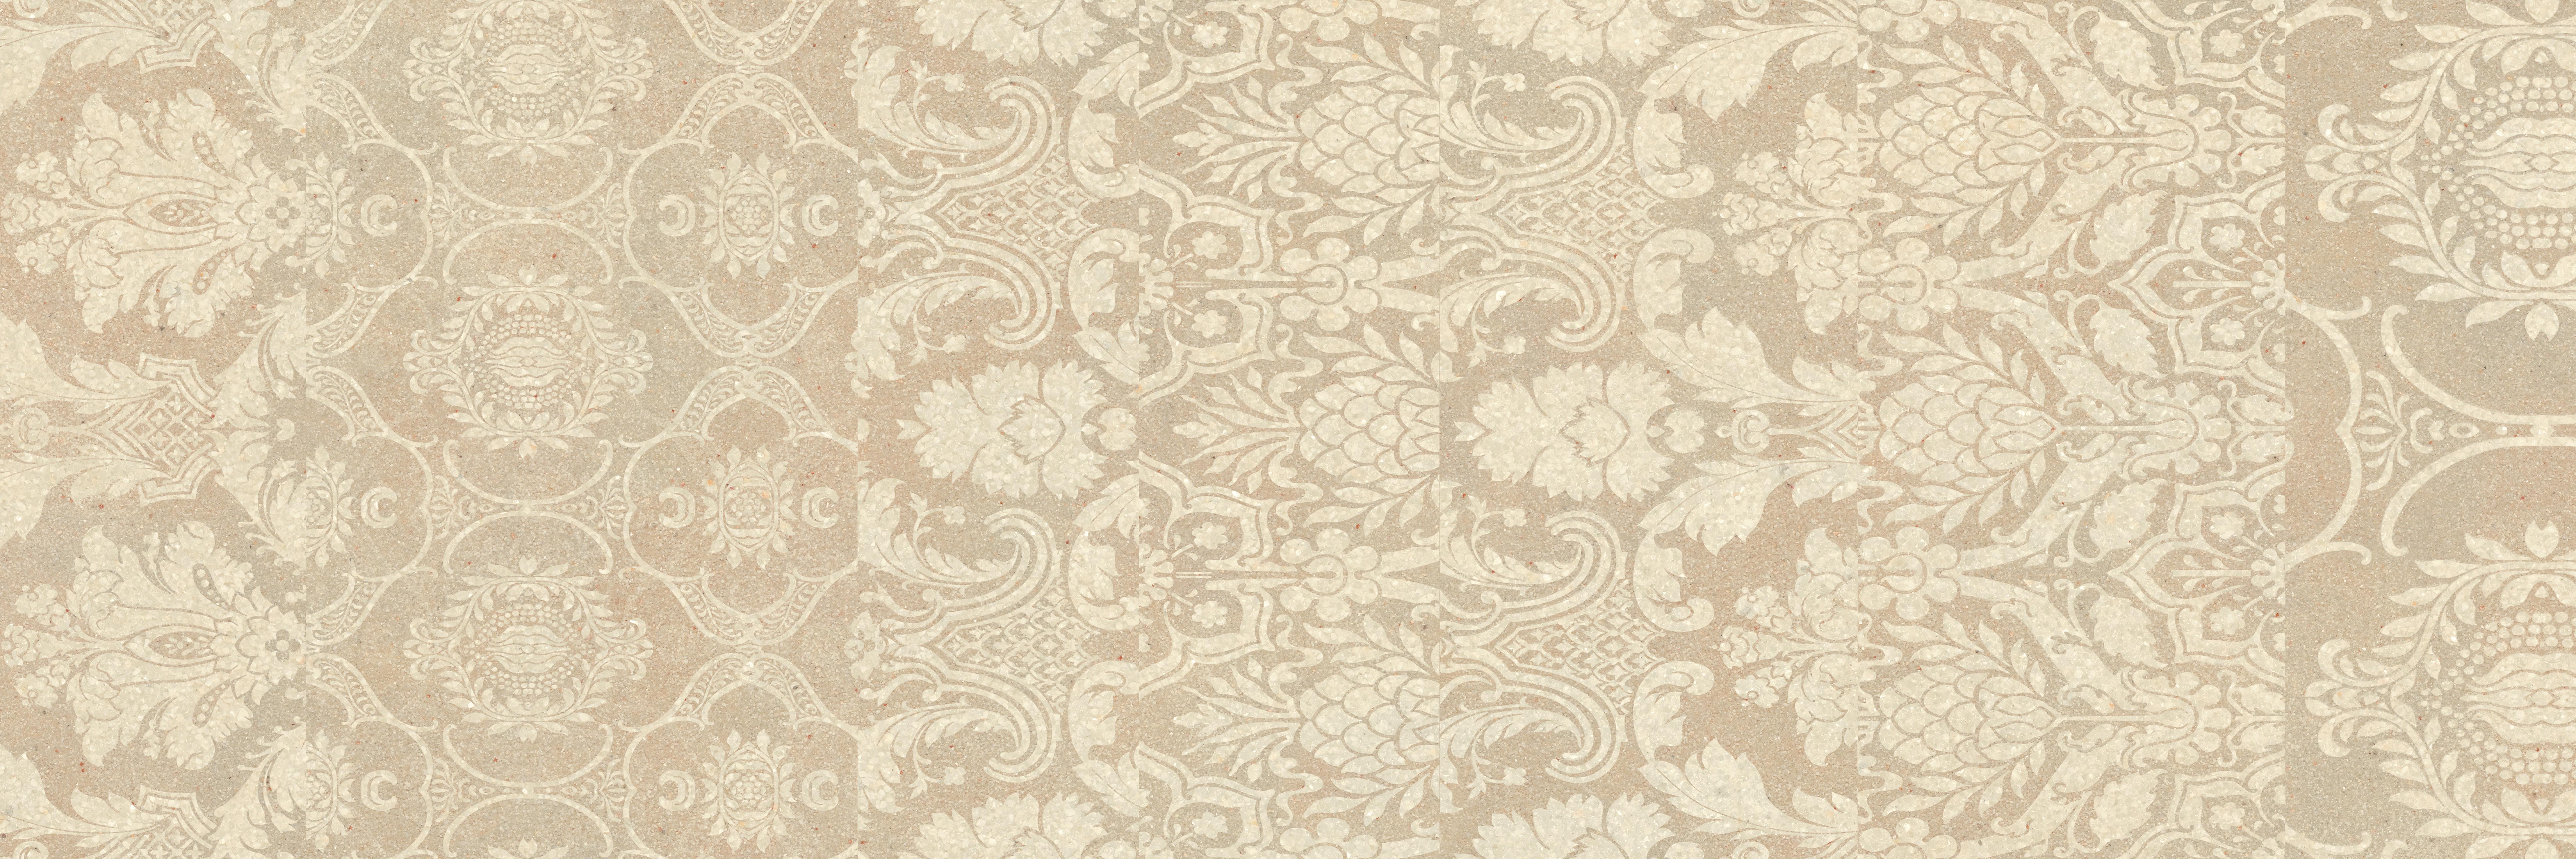 Serenata beige Плитка настенная 03 25х75 настенная плитка realonda ceramica andalusi dubai beige 30 85x55 6